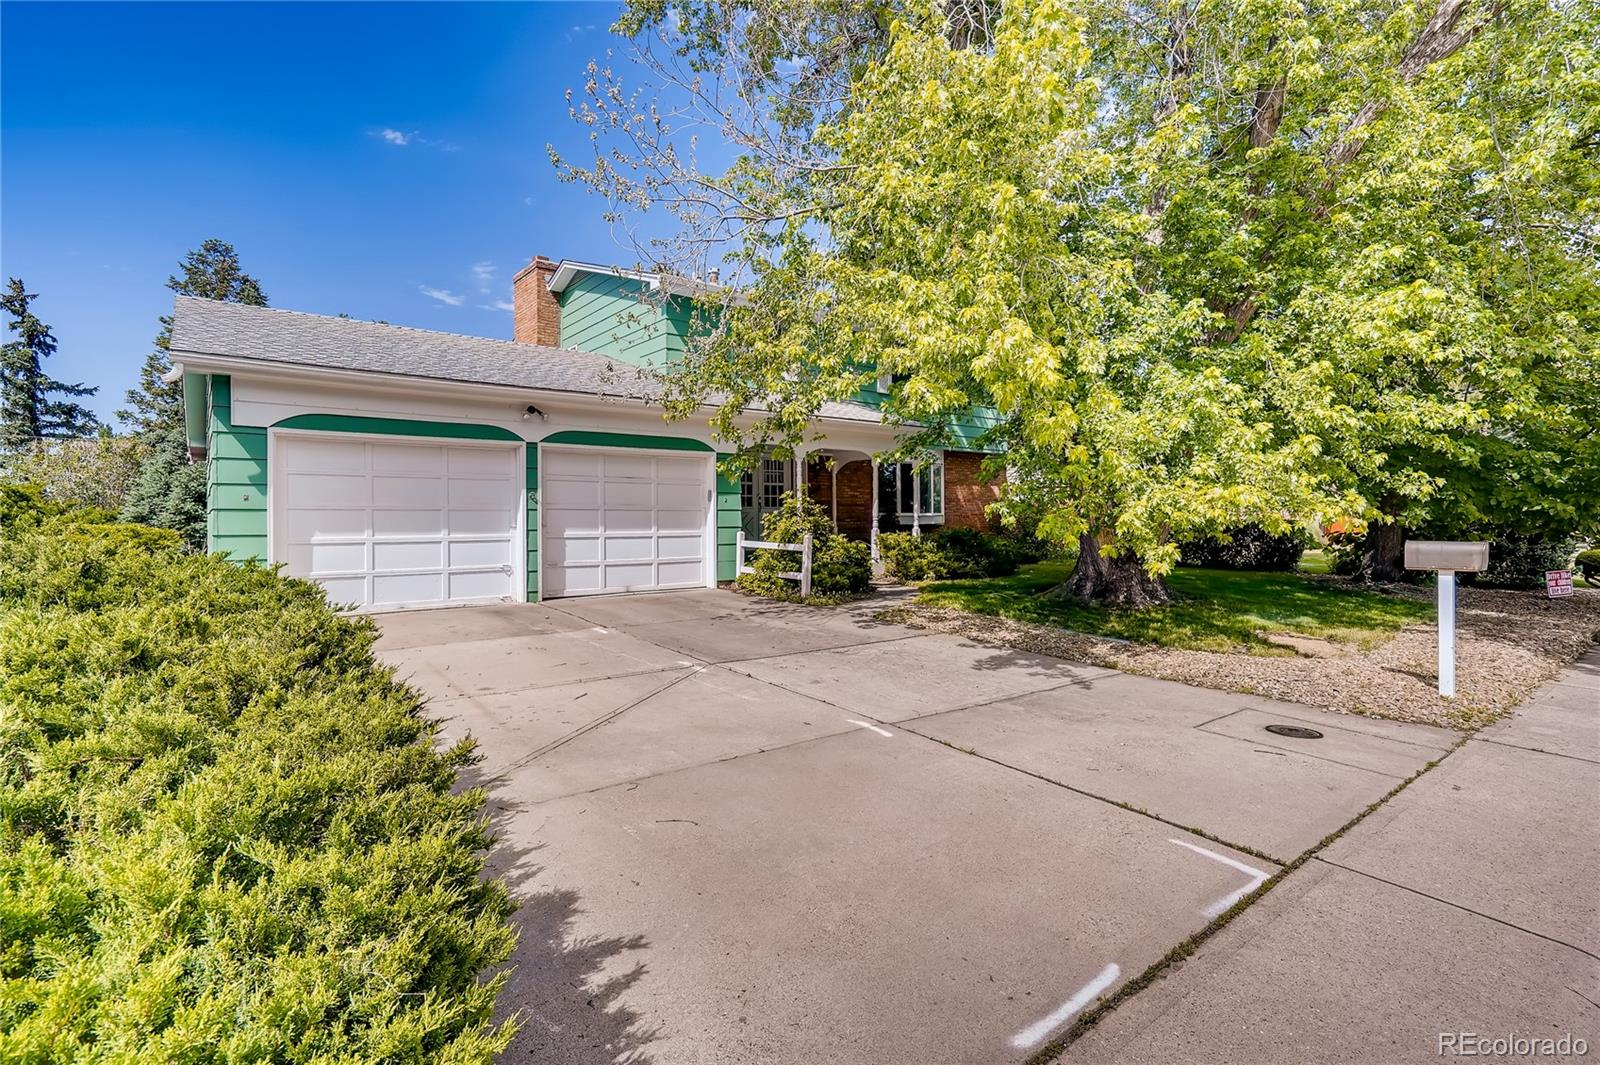 12257 W 67th Avenue Property Photo - Arvada, CO real estate listing